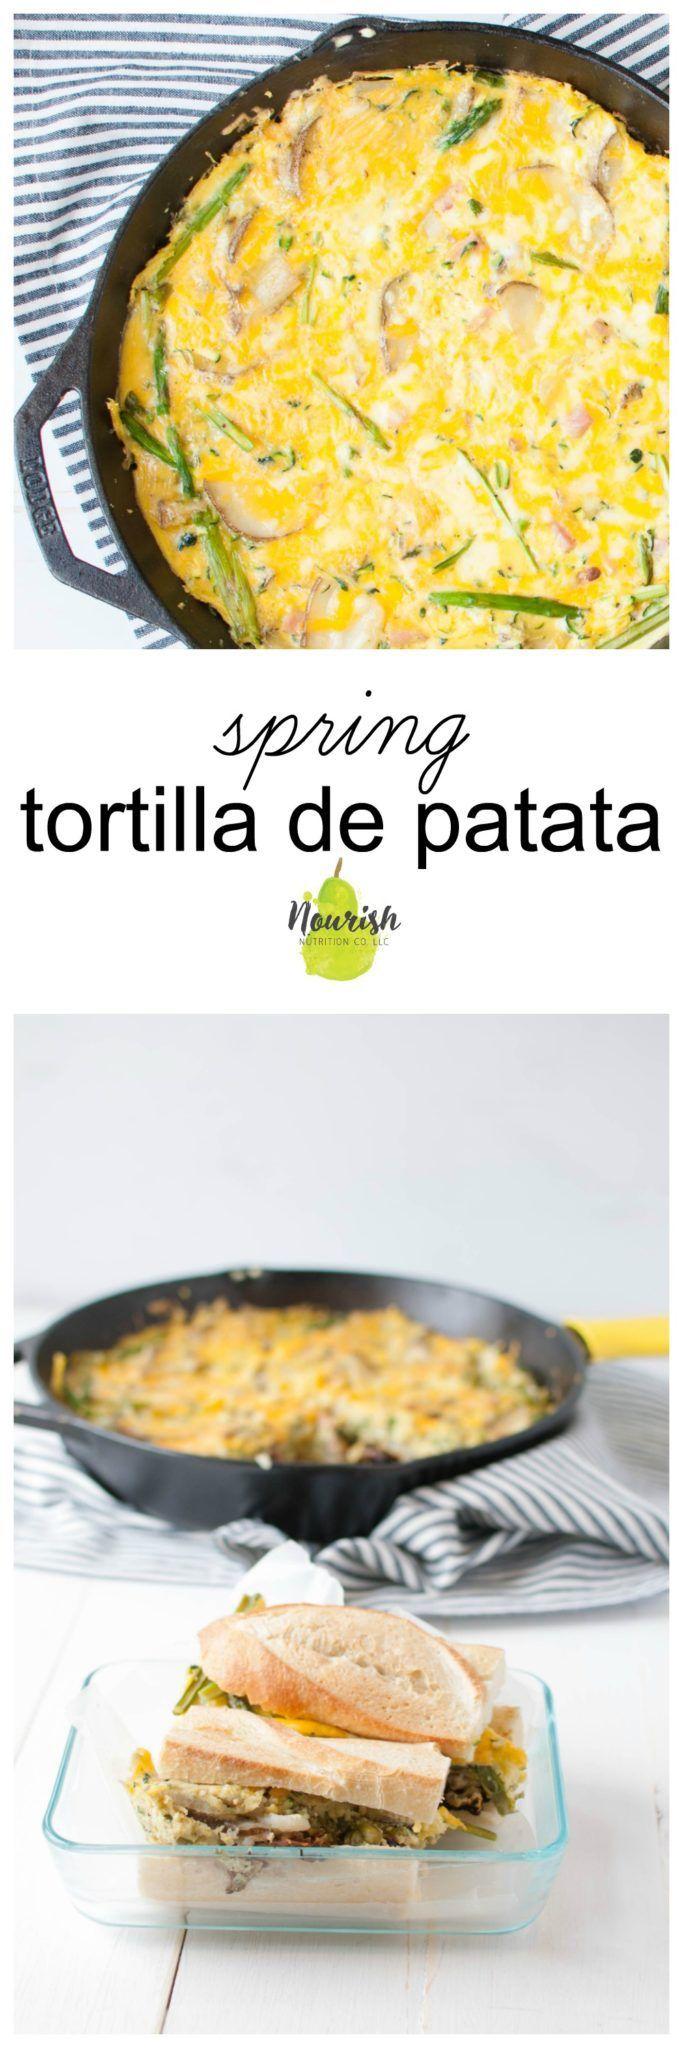 Spring Tortilla de Patata Sandwich